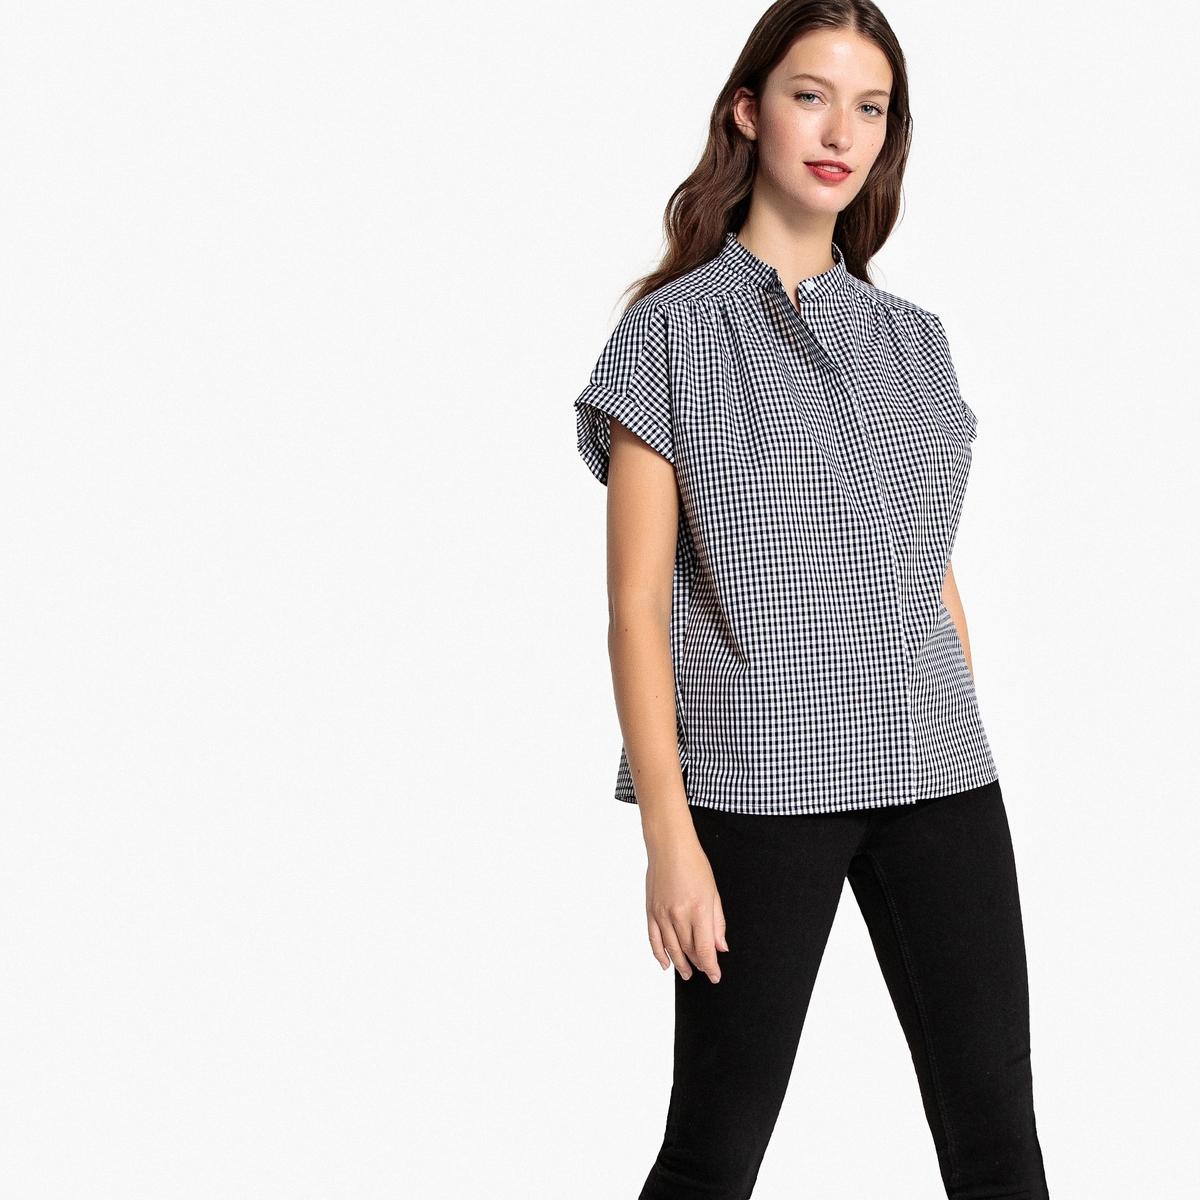 Camisa a cuadros de manga corta, 100% algodón